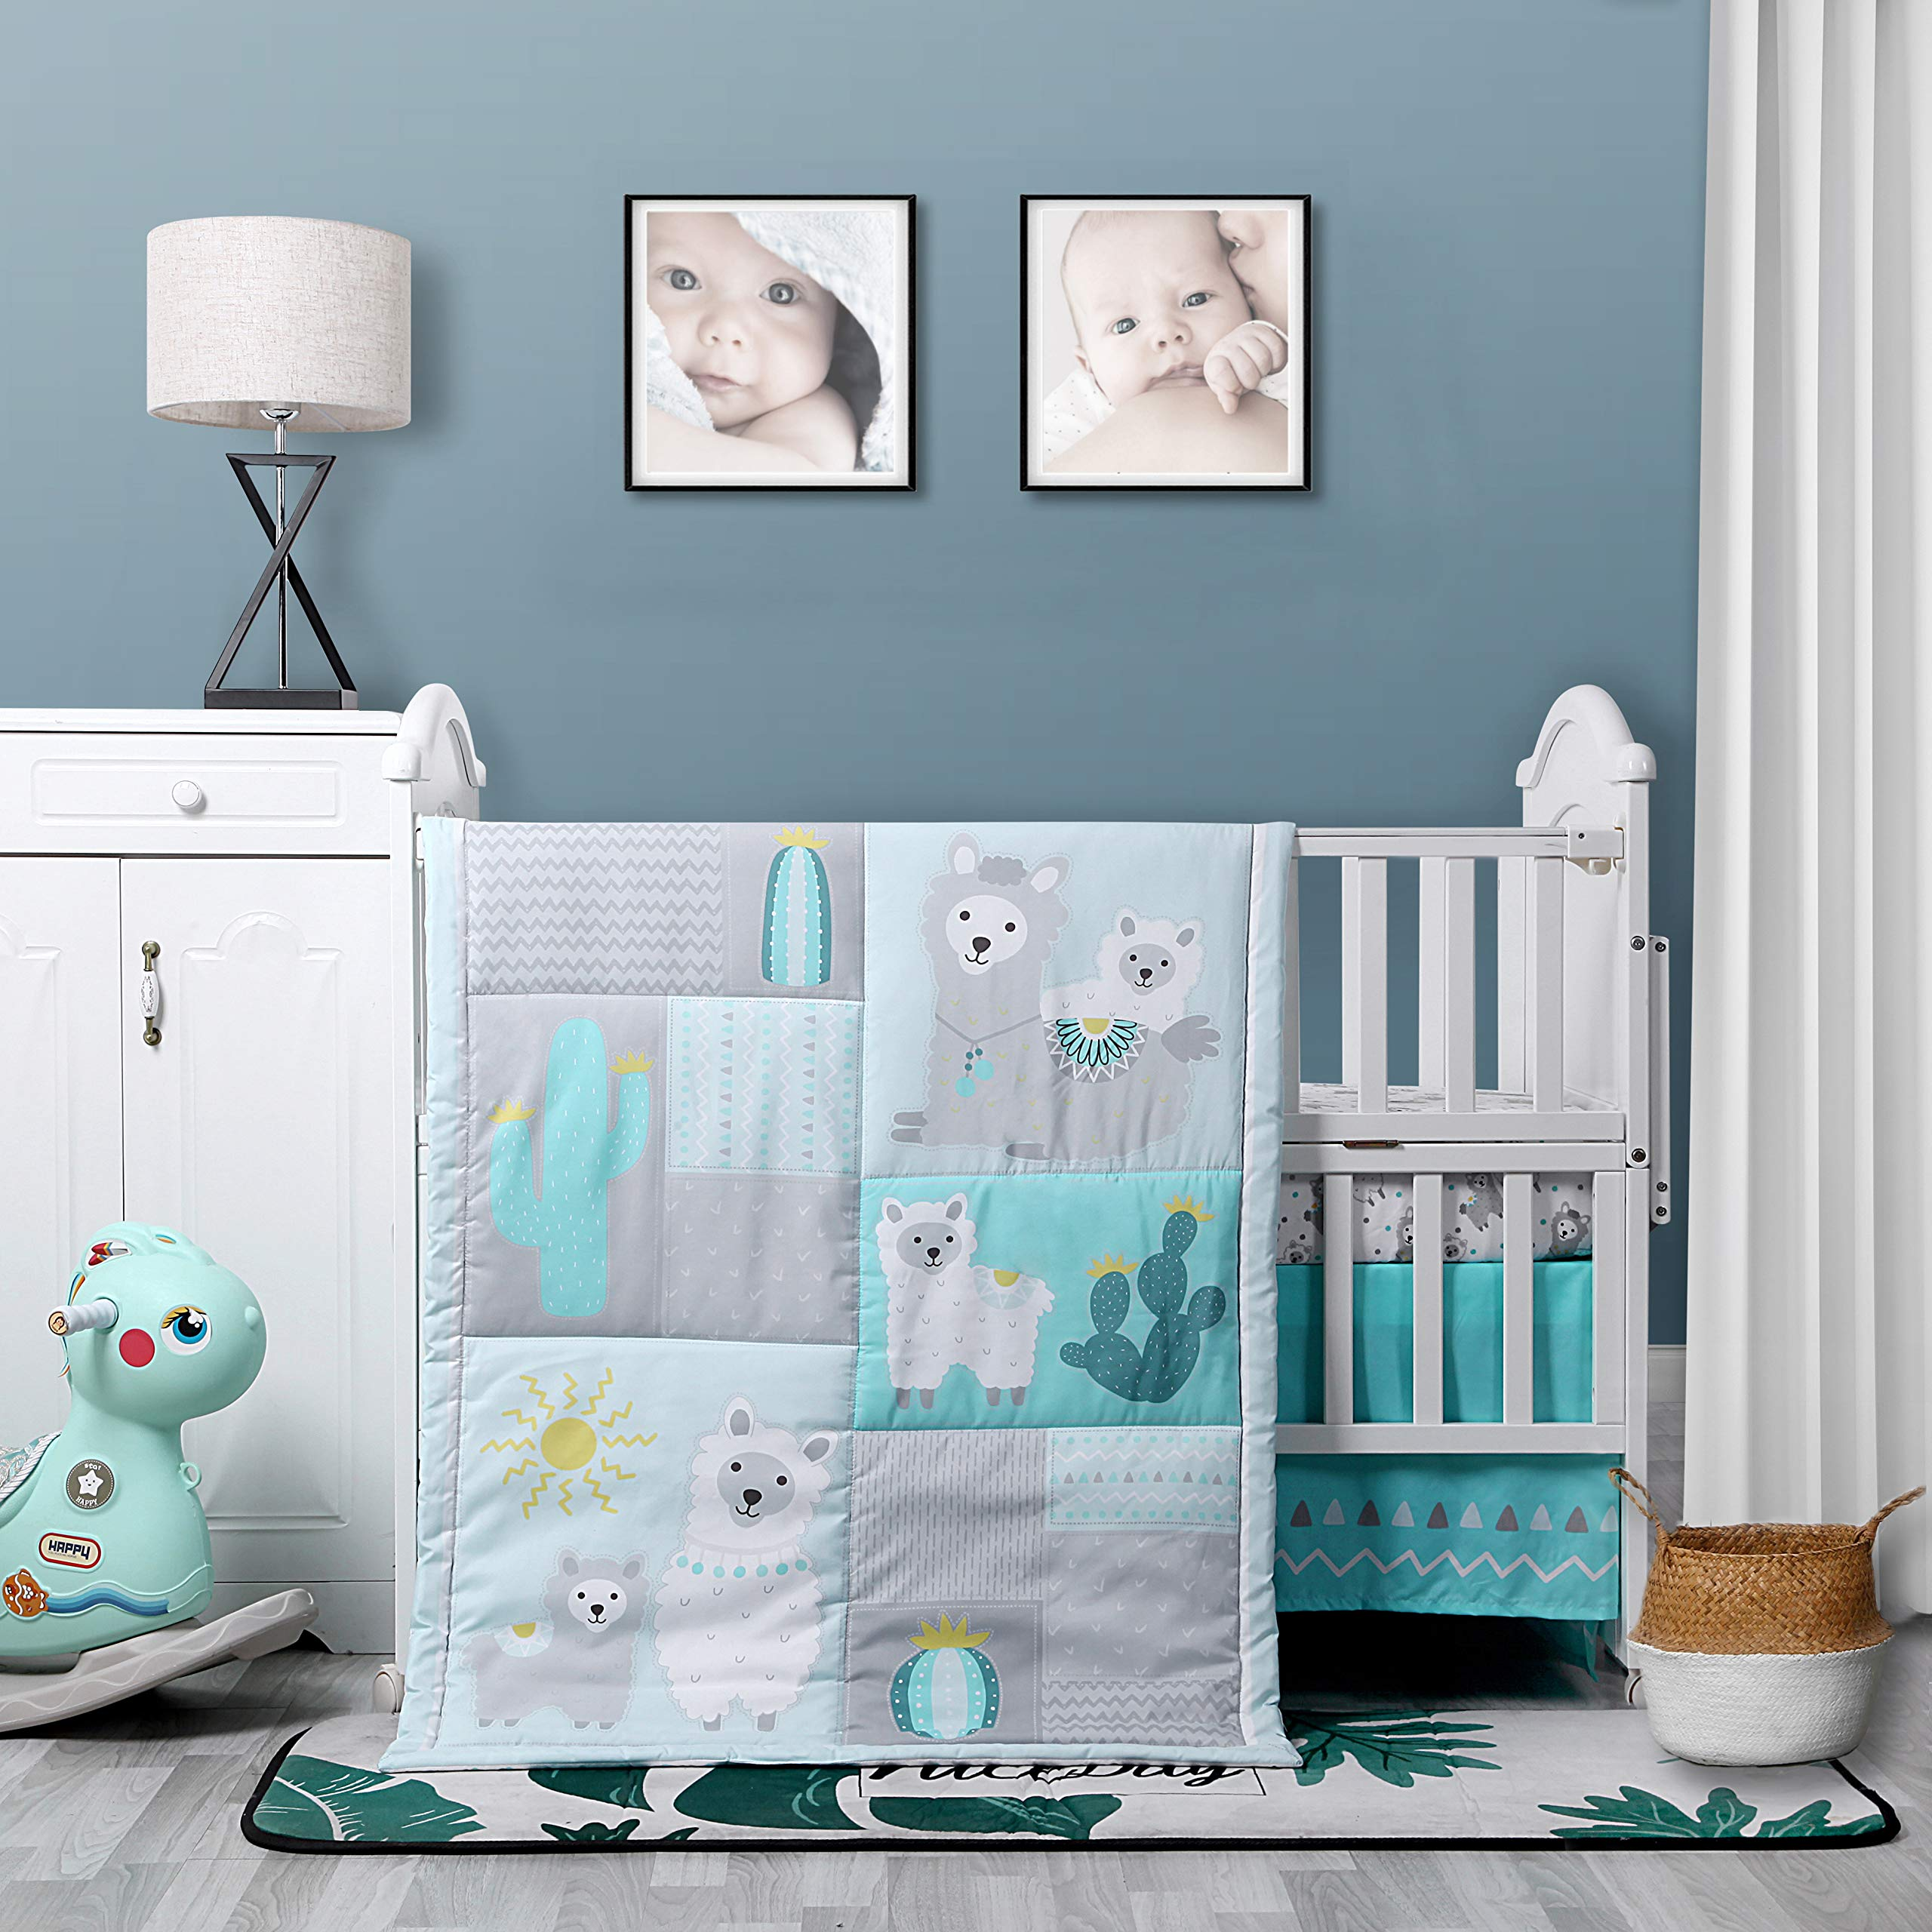 Baby Nursery Turquoise and Grey Crib Bedding Sets: La Premura Llama and Cacti 3 Piece Standard Size Crib Set by La Premura